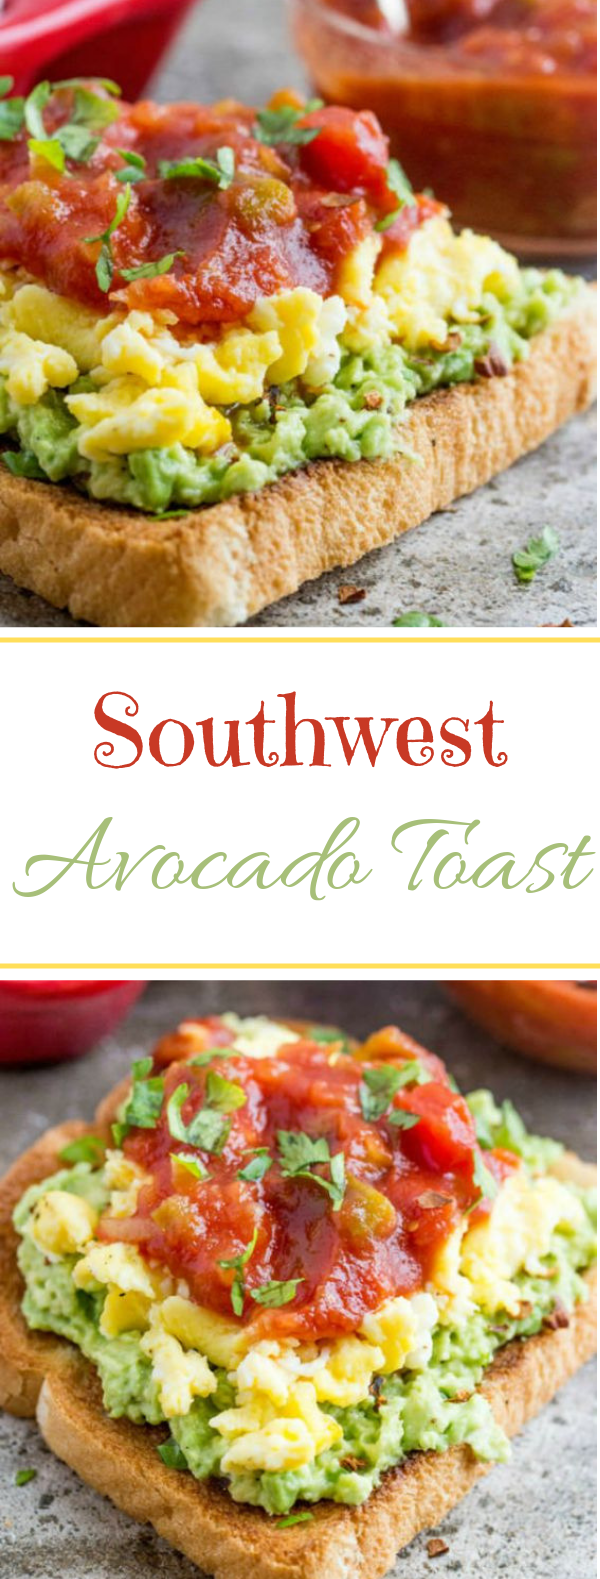 Southwest Avocado Toast #toast #vegetarian